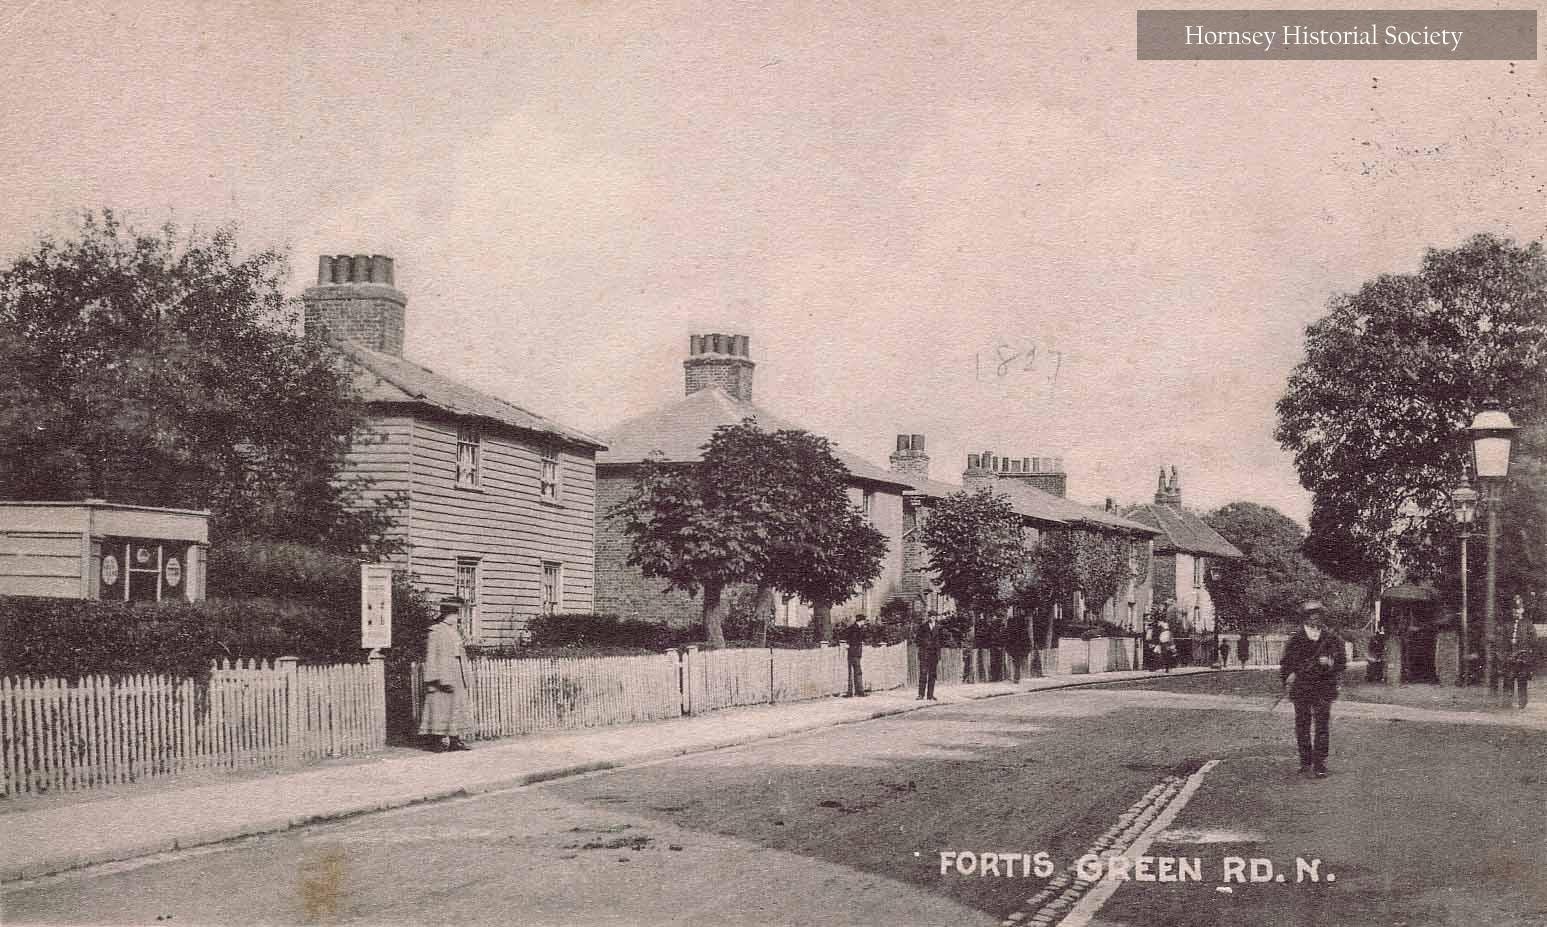 Cottages, Fortis Green Road